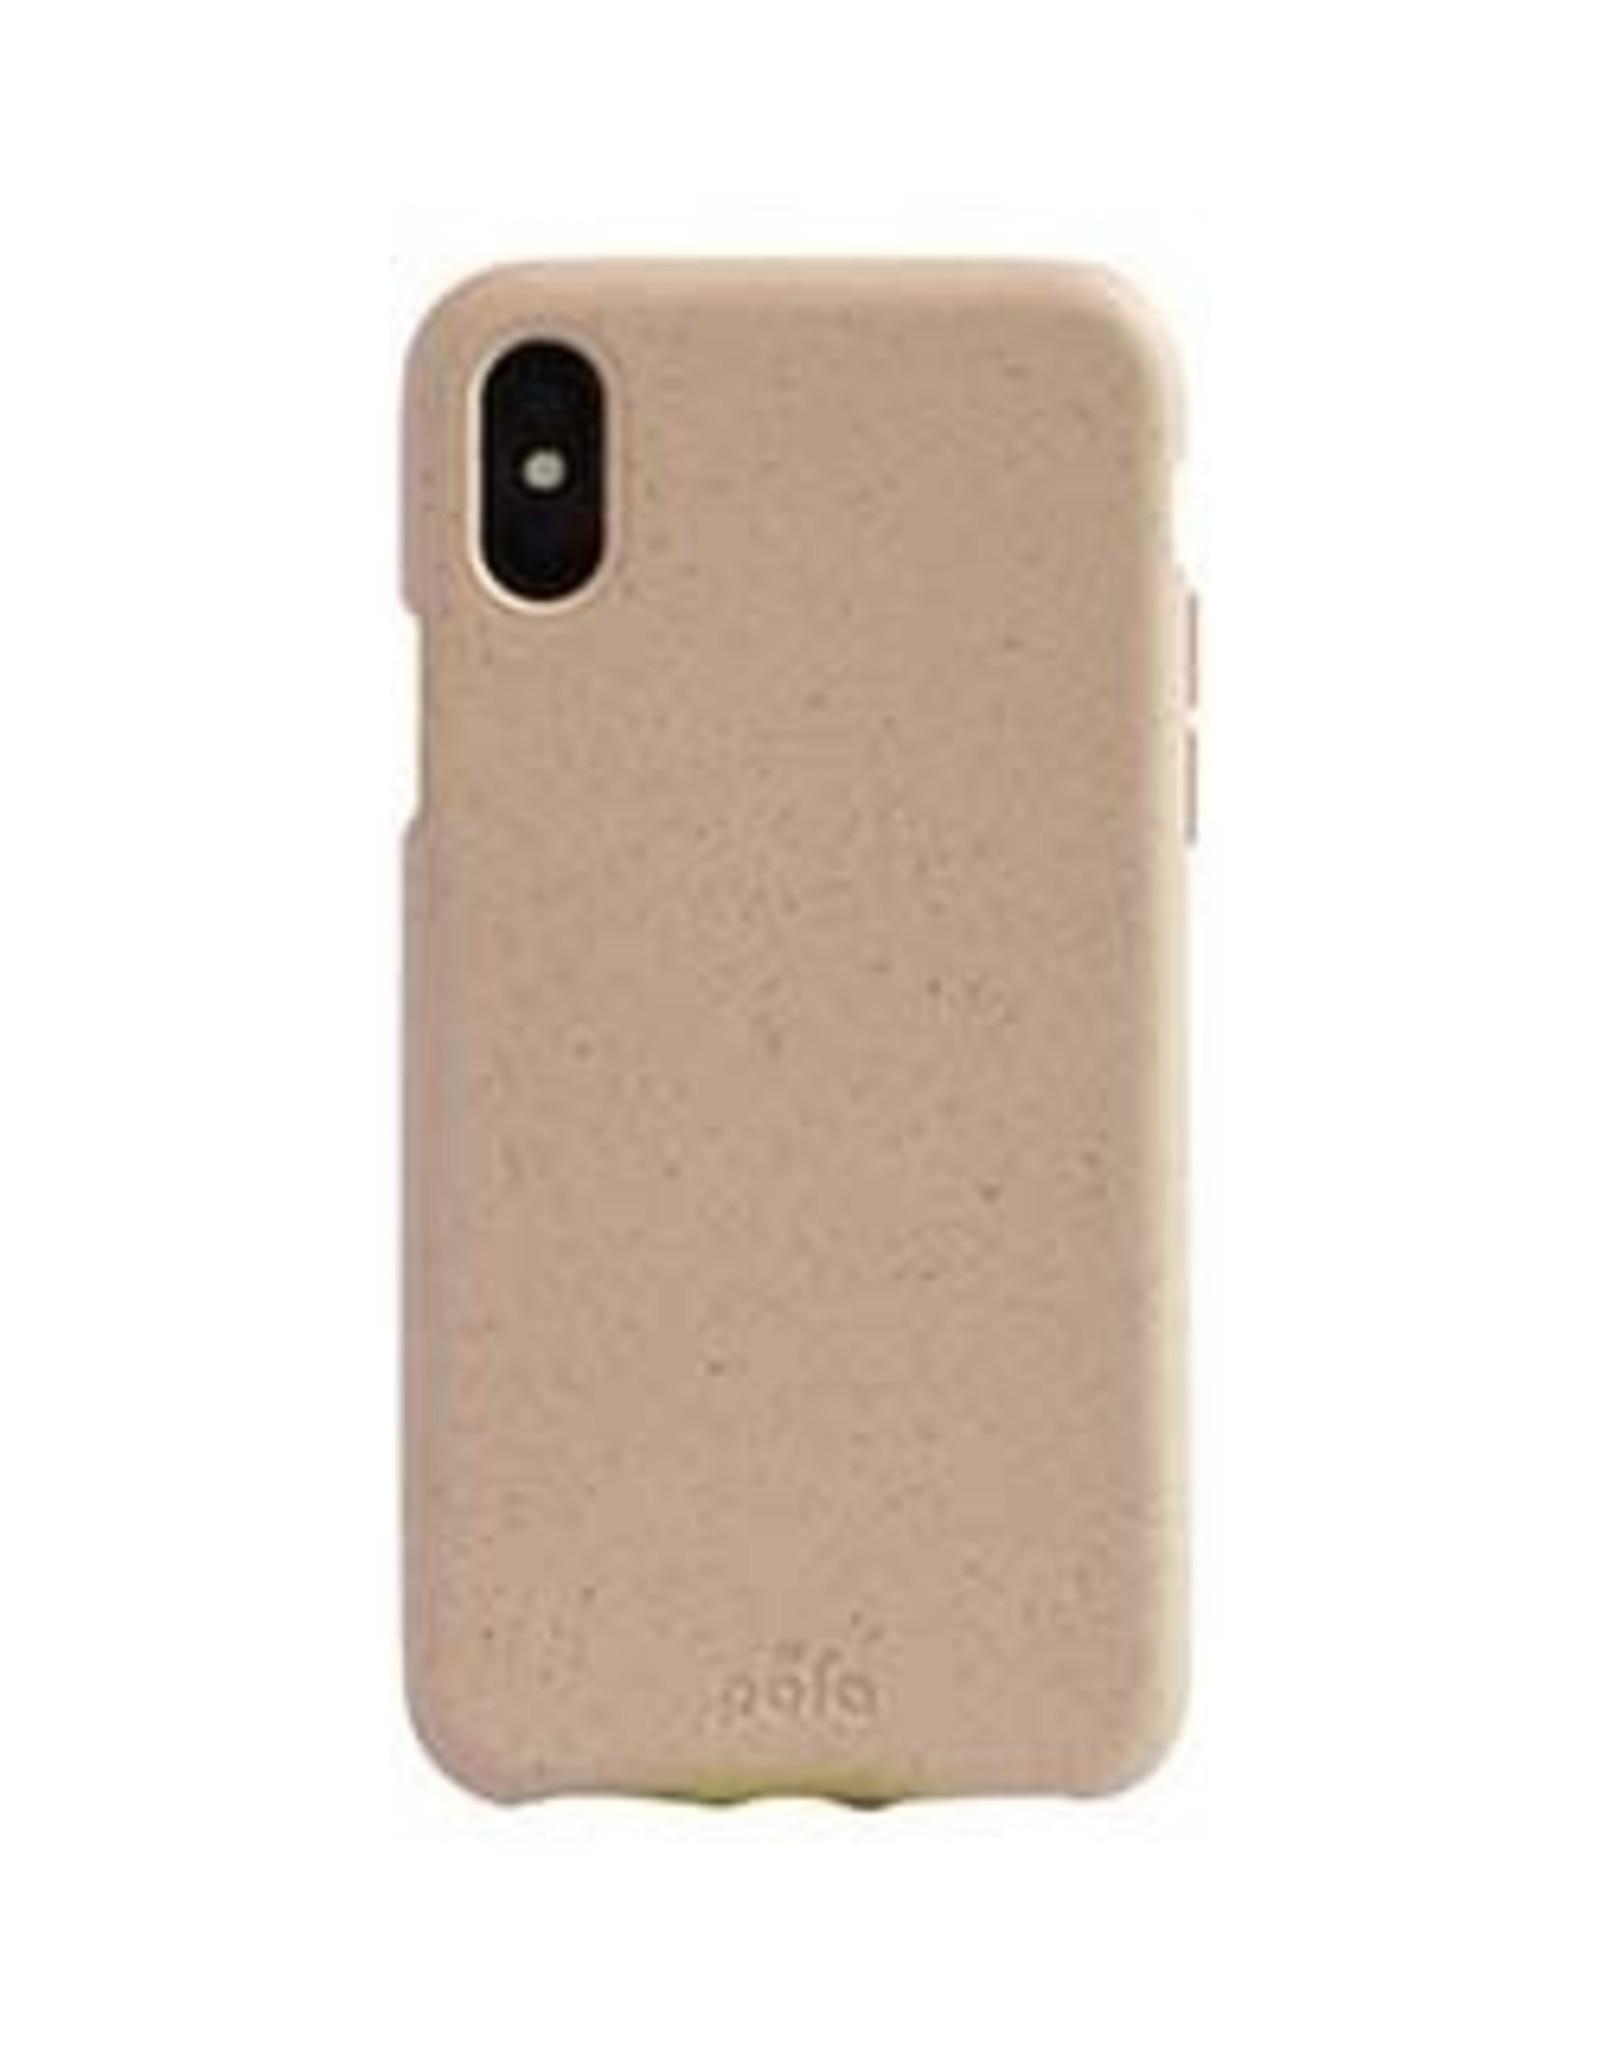 Pela Pela | iPhone Xs Max Pink (Sea Shell) Compostable Eco-Friendly Protective Case | 15-04721